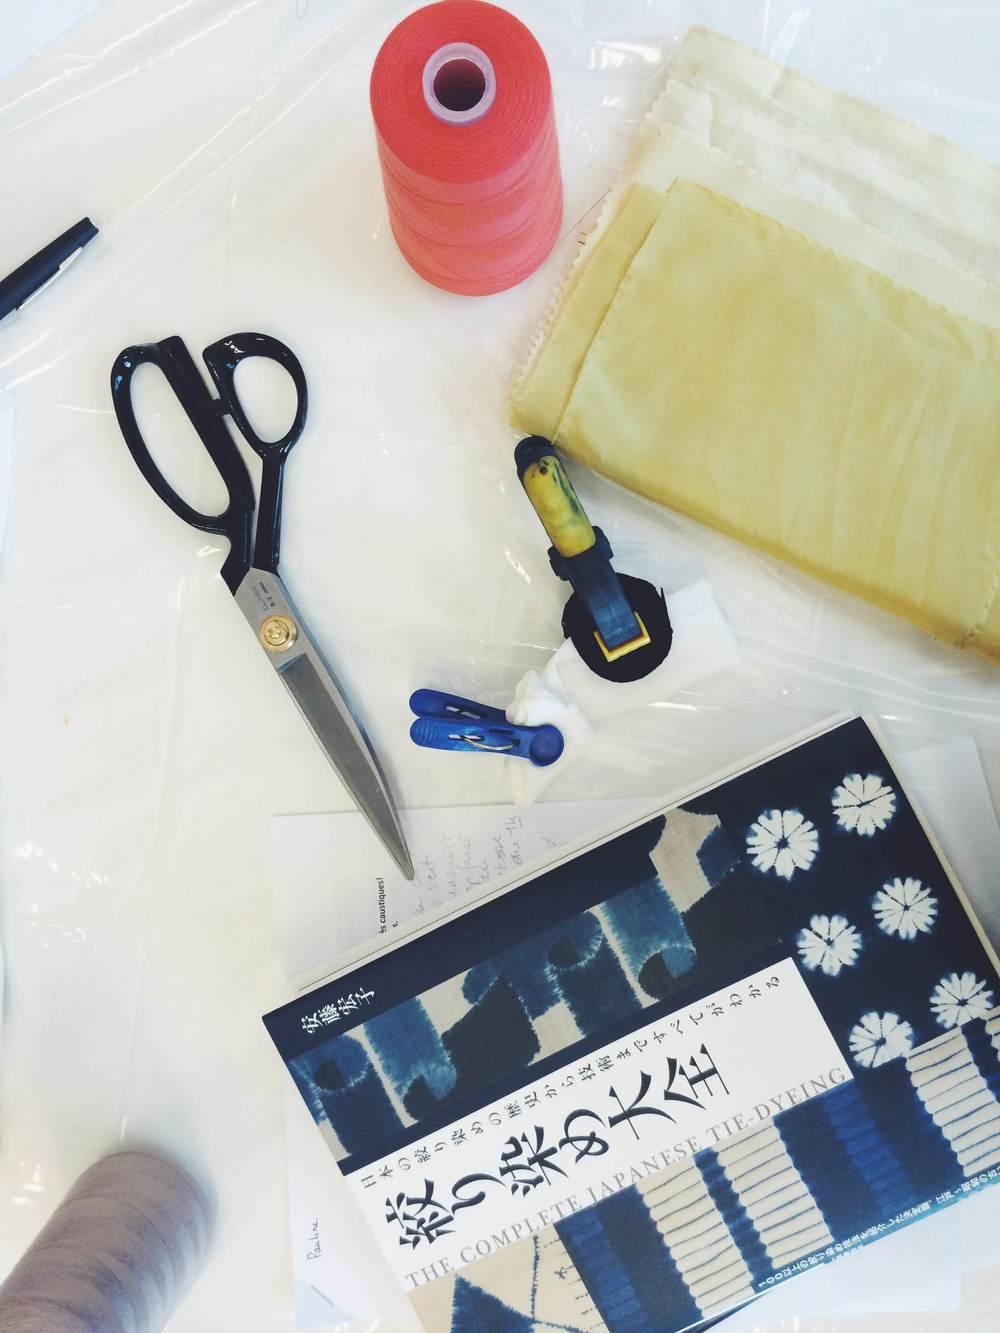 miss_cloudy_blog_pauline_loctin_tie_dye_indigo_shibori_infuse_textile15.jpg